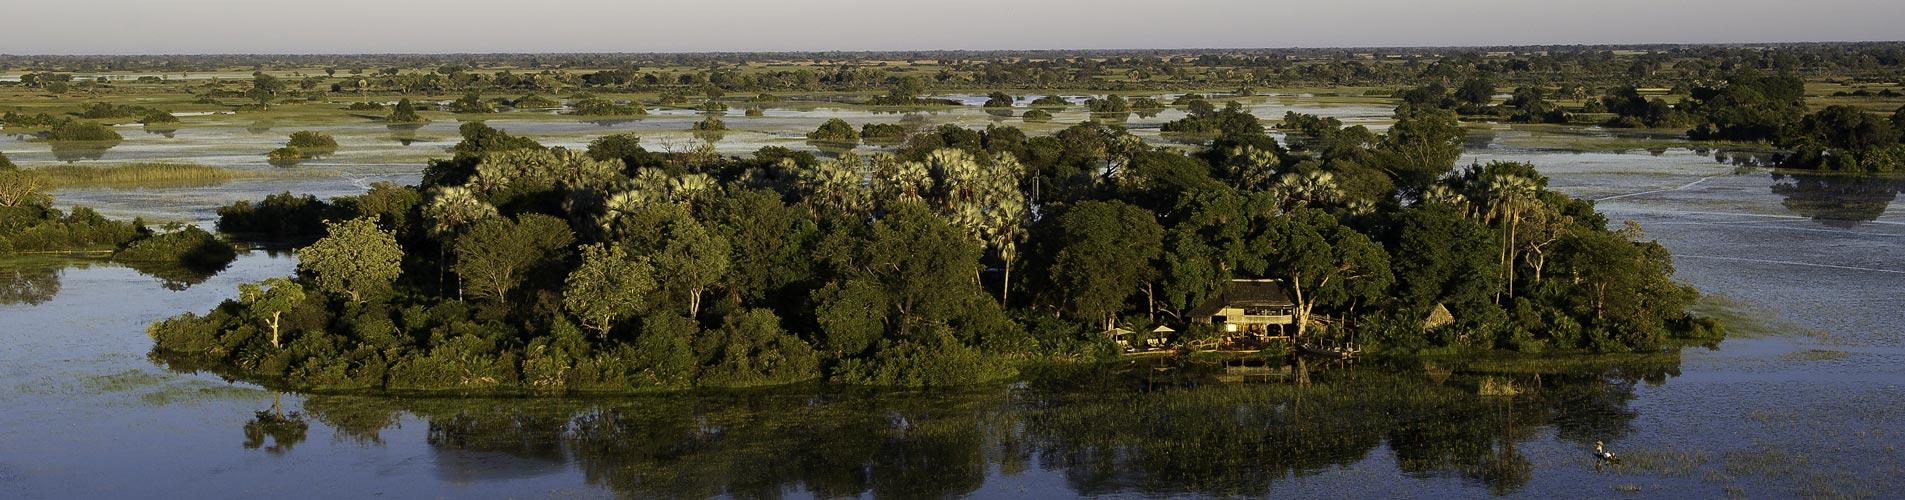 Botswana Safaris Jacana